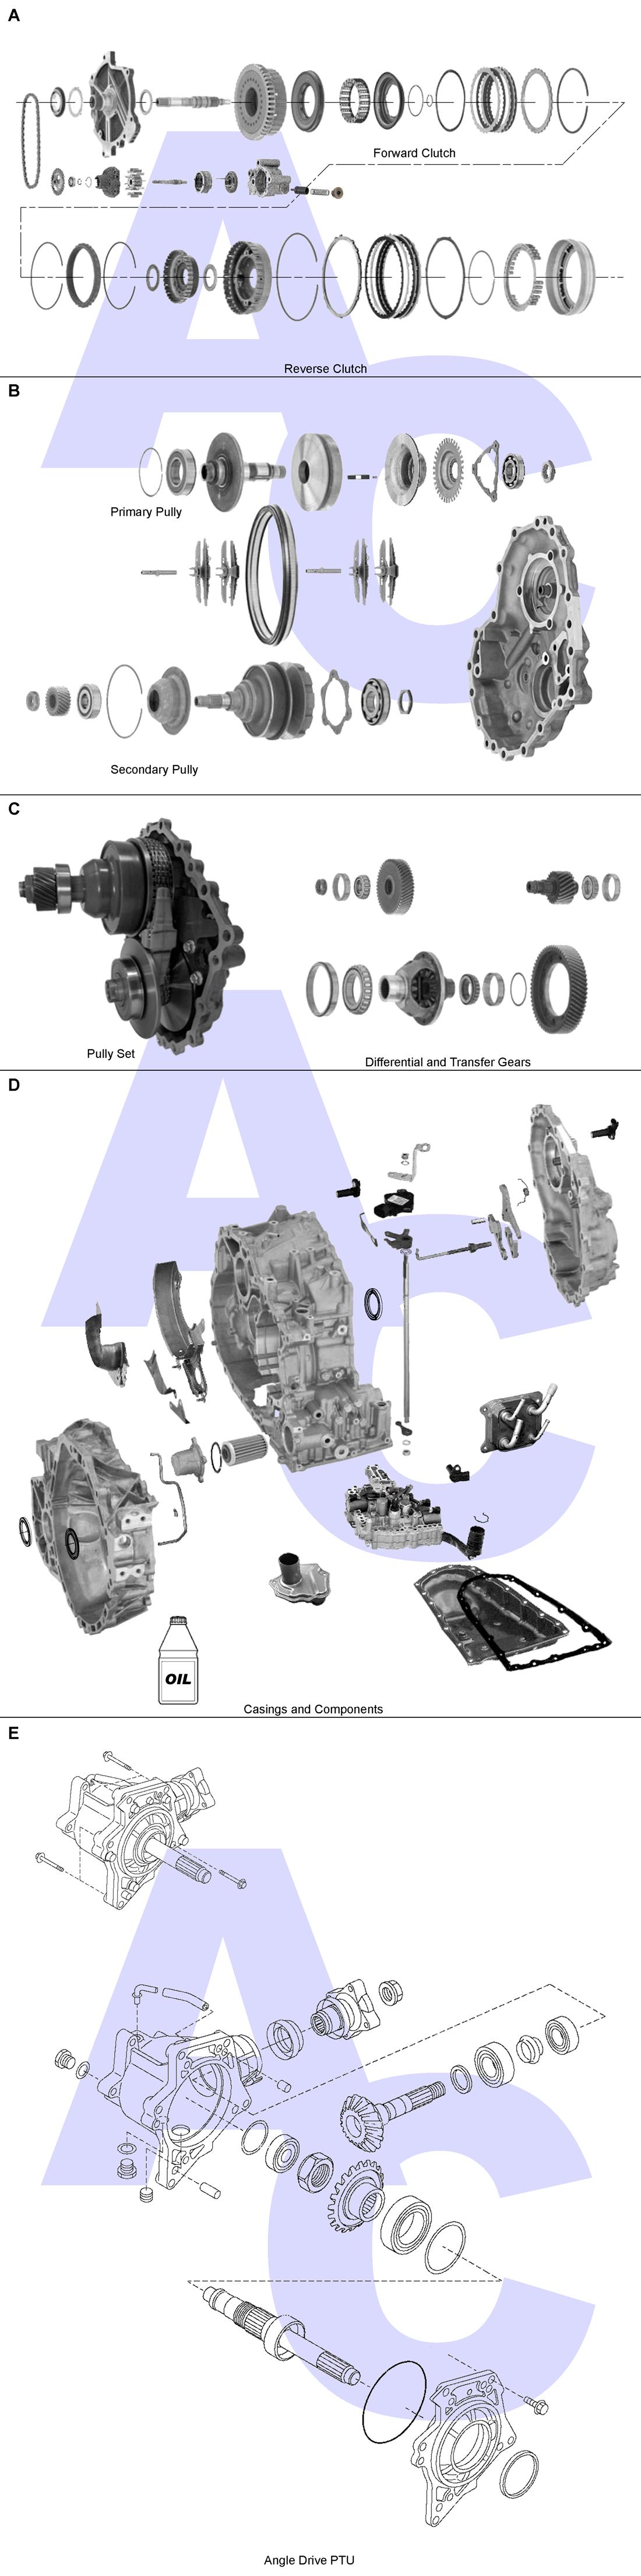 JF016E CVT Transmission Parts Catalogue - Automatic Choice